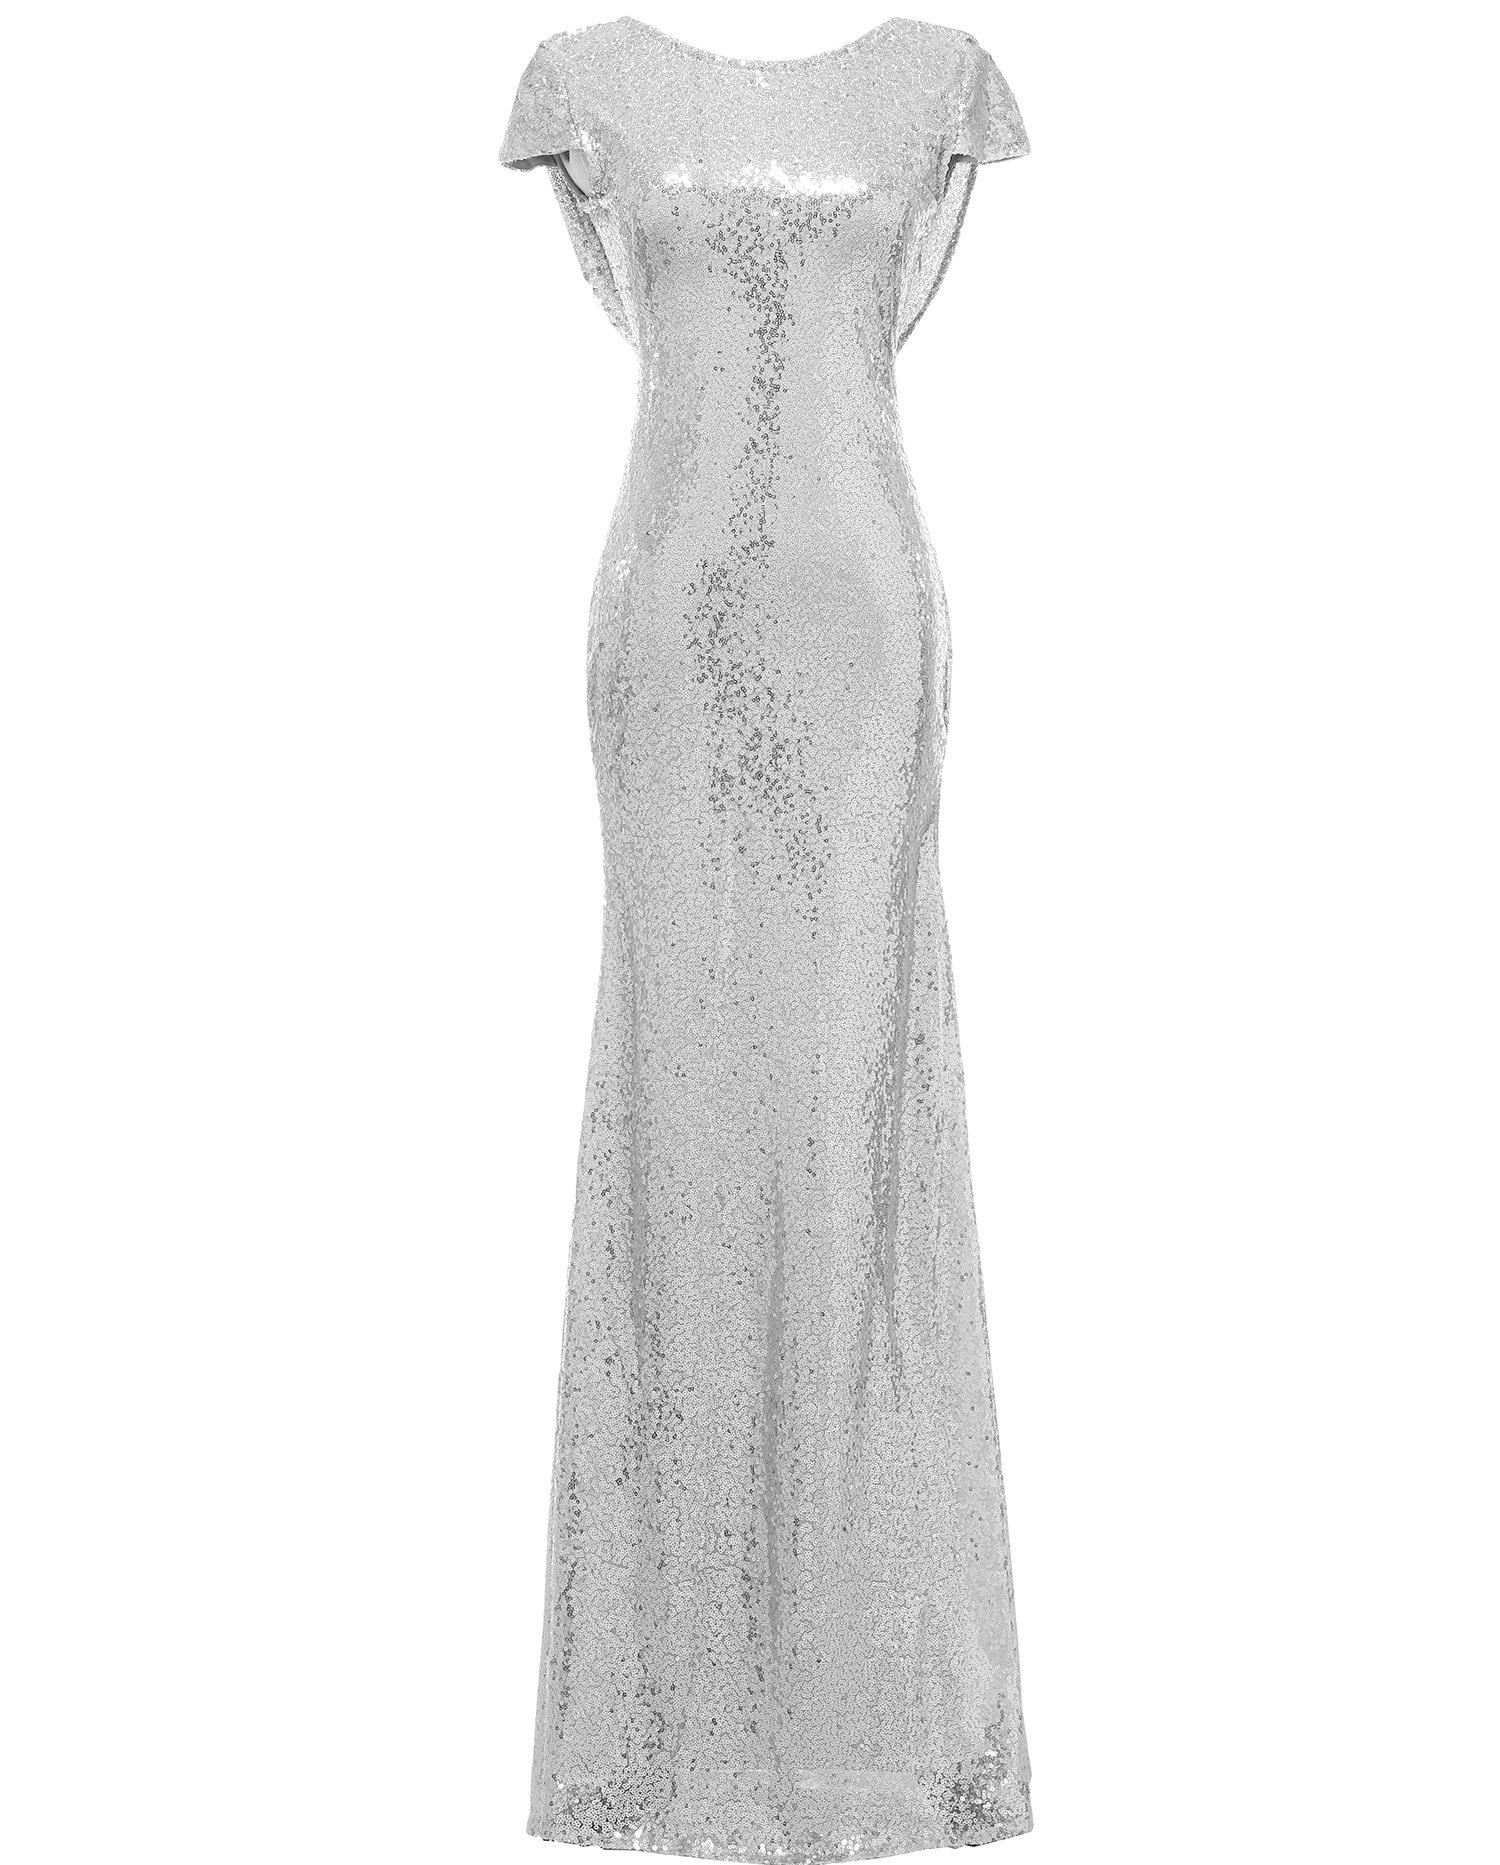 Silver Sequin Bridesmaid Dress: Amazon.com